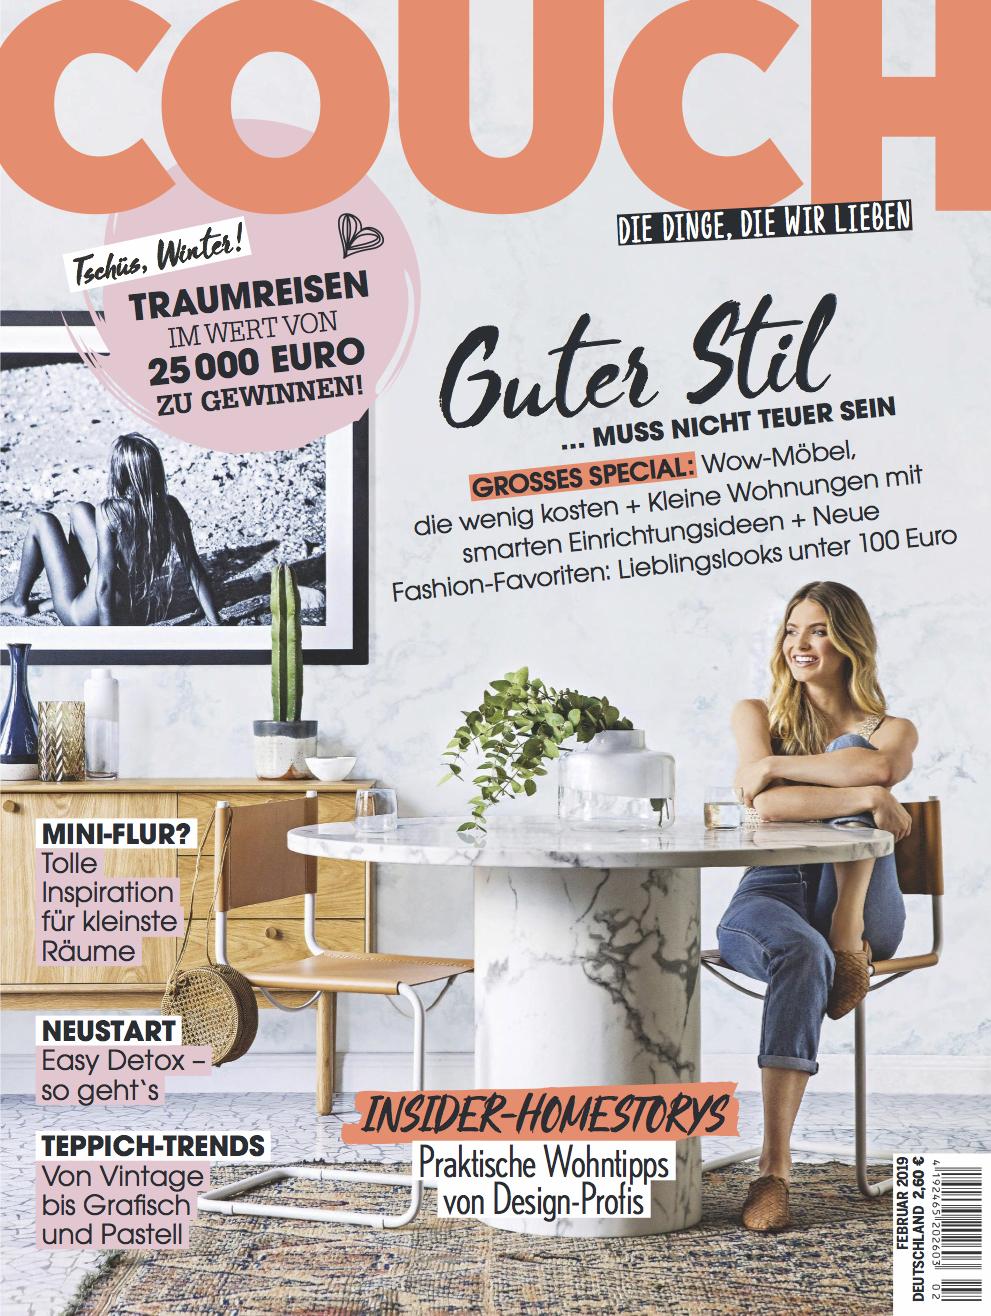 Kerrie-Ann Jones Couch magazine cover